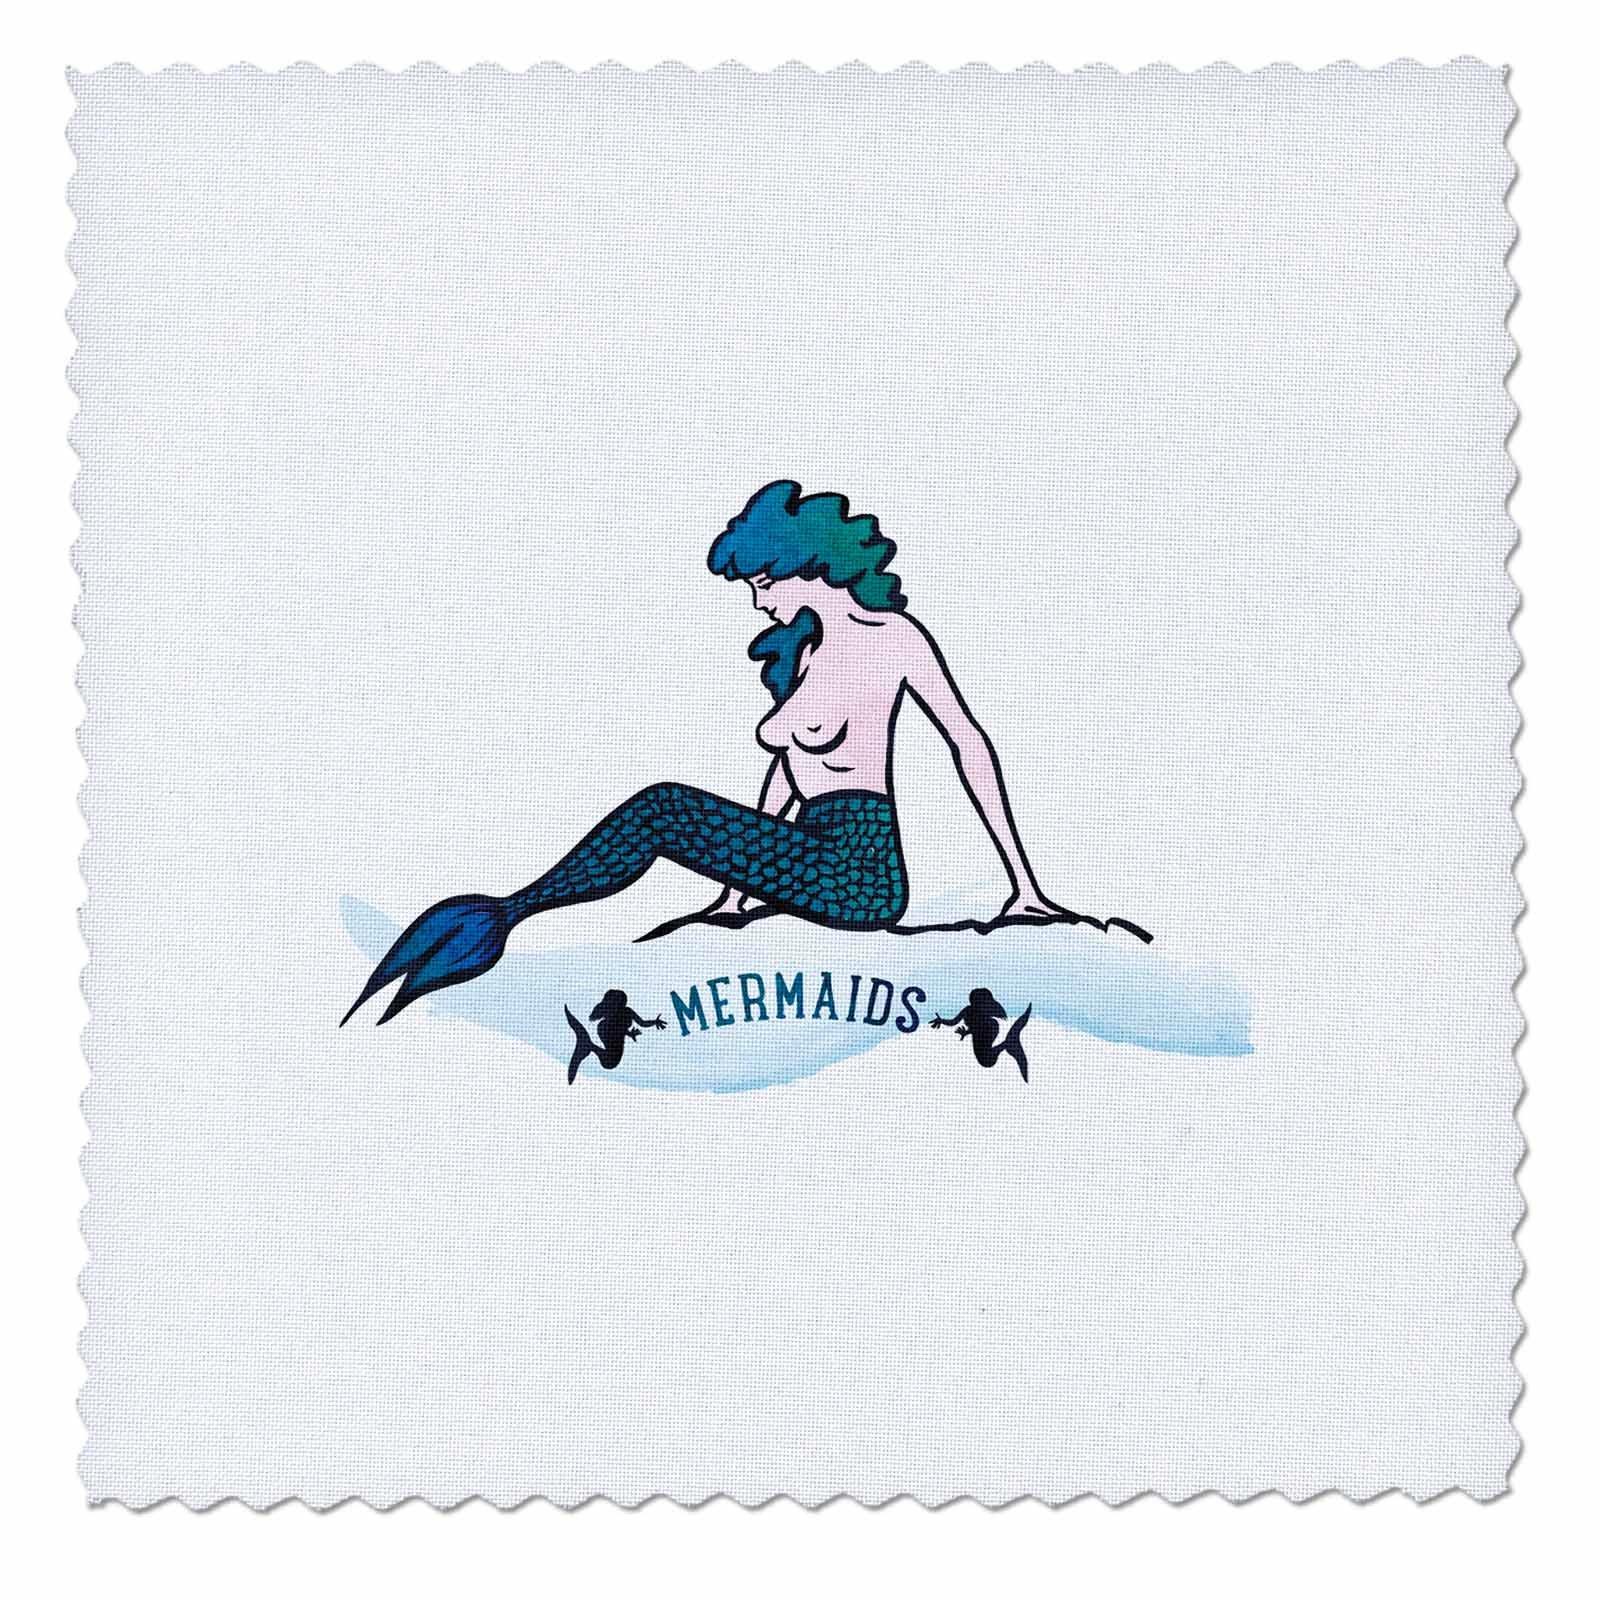 3dRose Sven Herkenrath Fantasy - Fantasy Mermaid Animal Fish Water Sealife - 22x22 inch quilt square (qs_280315_9)